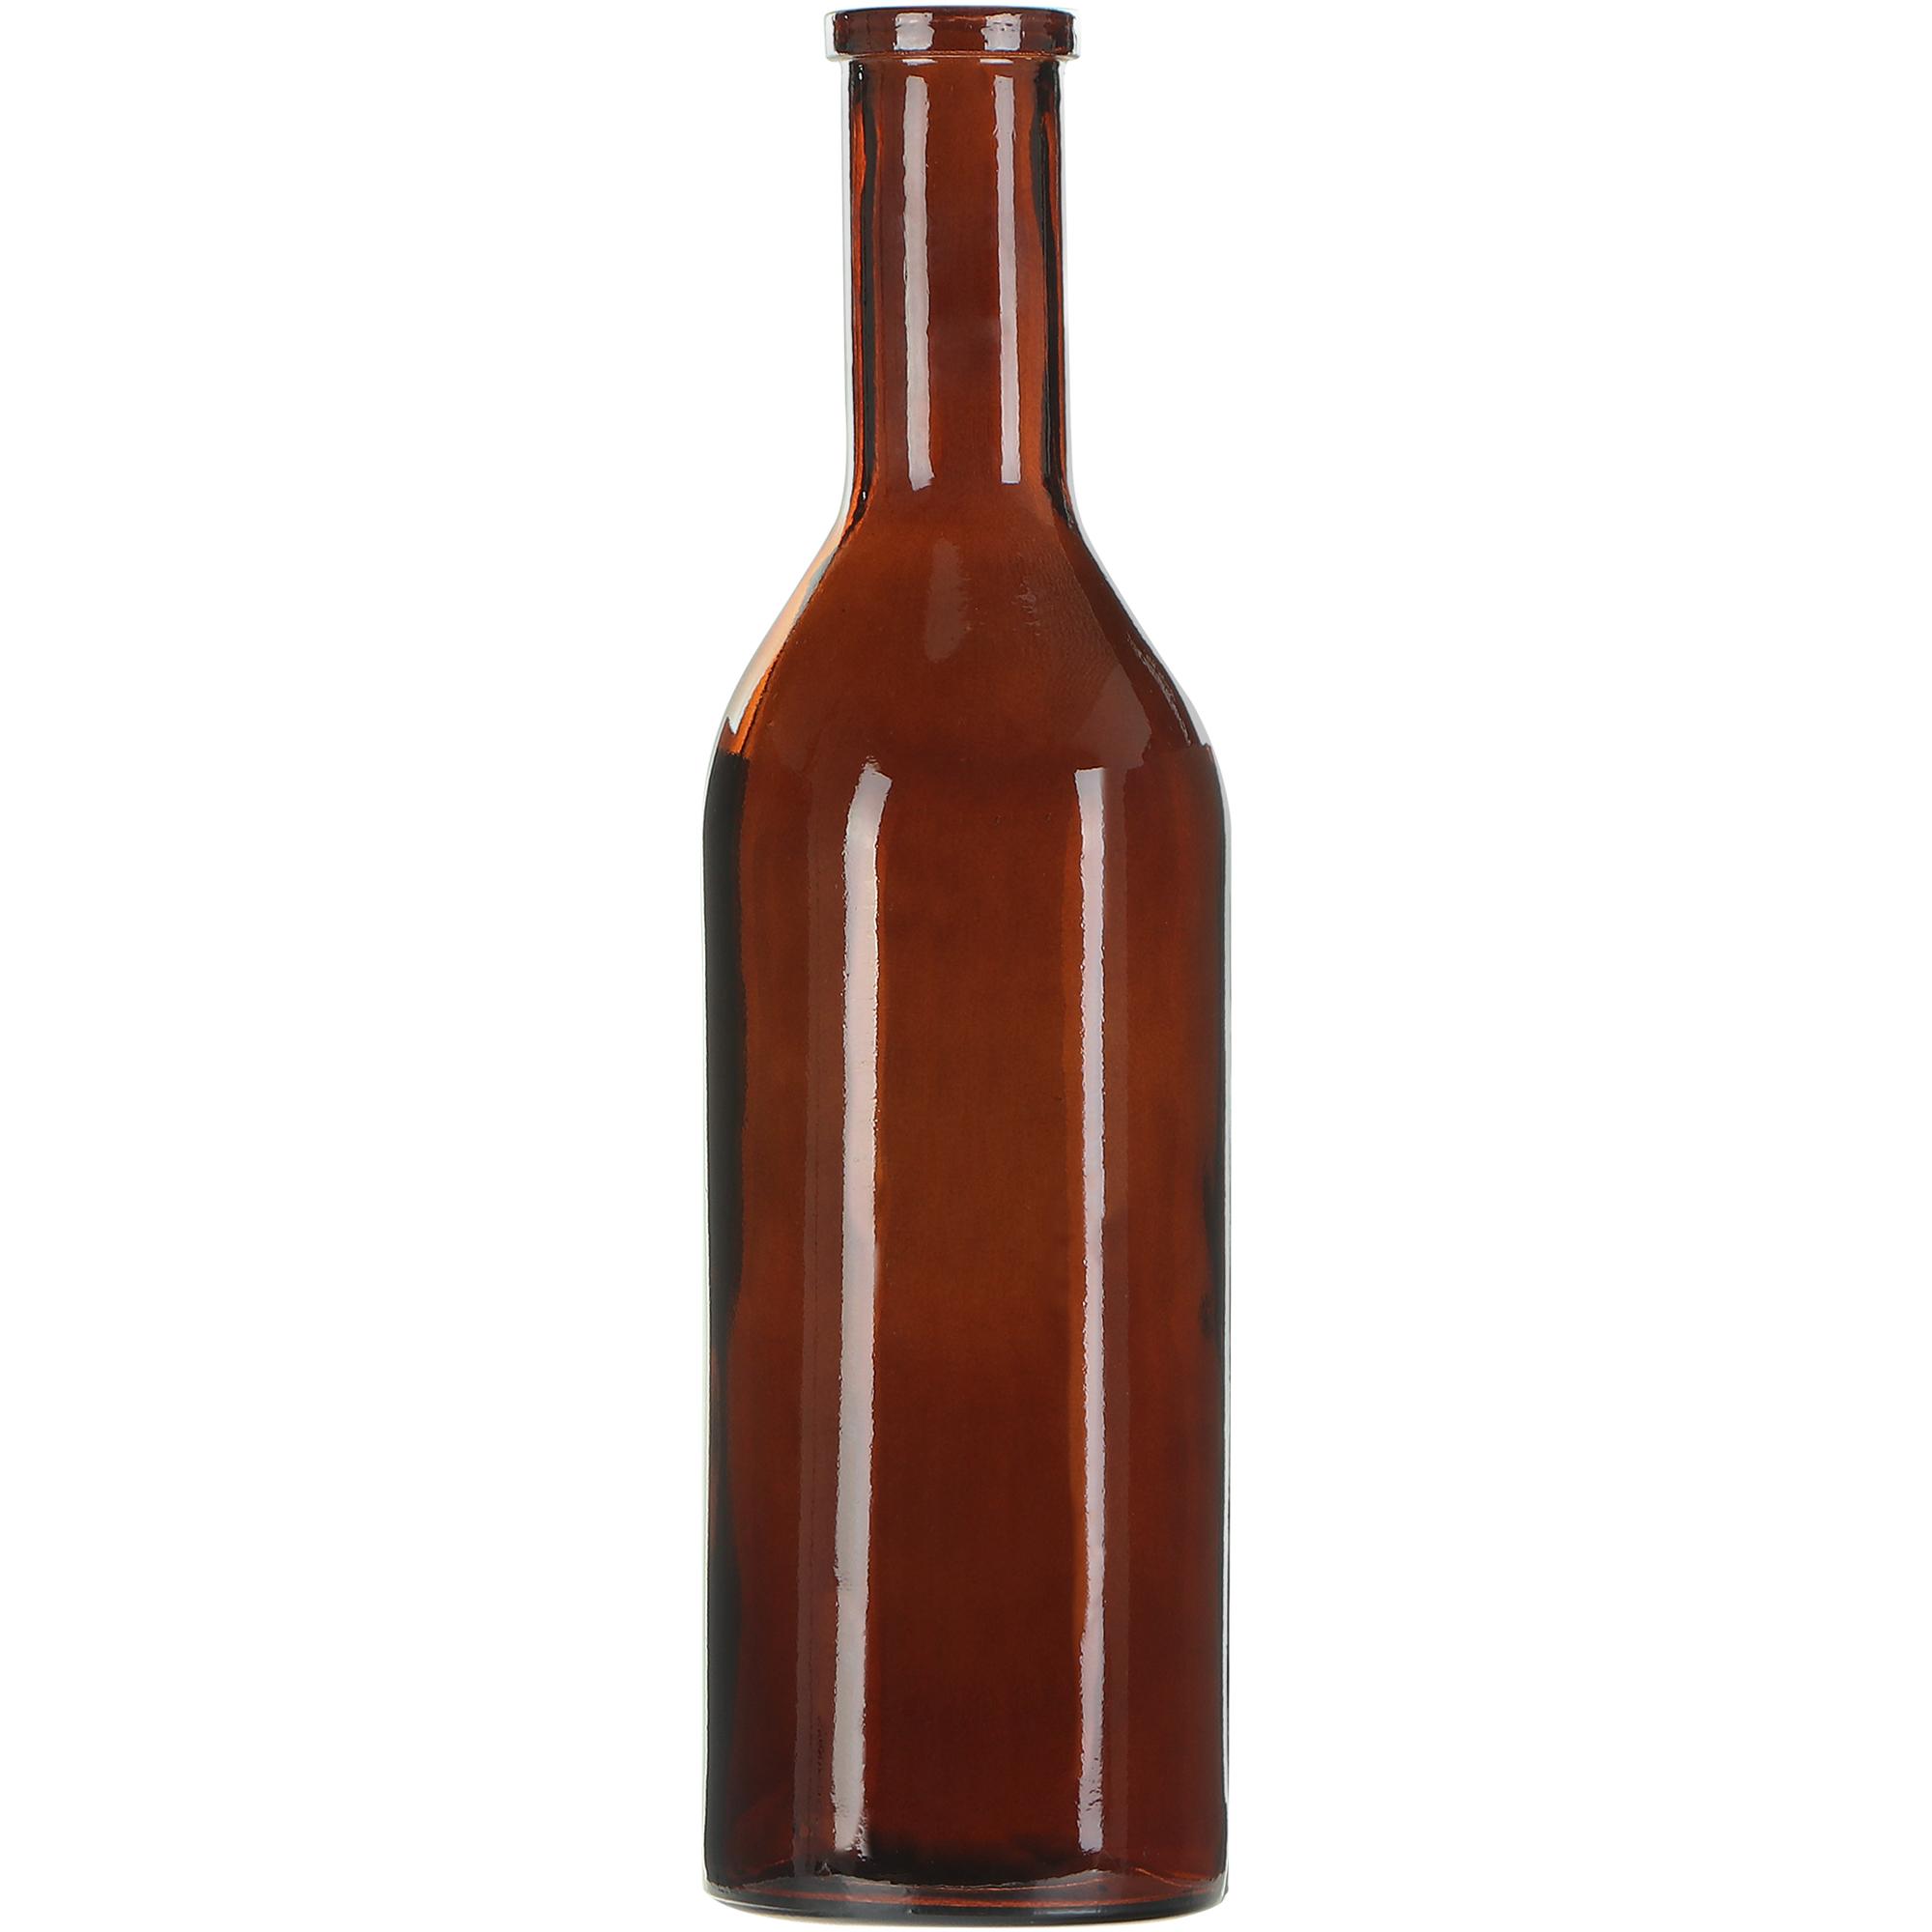 Ваза декоративная Kersten, 15х15х50 см ваза декоративная kersten 18х18х80 см